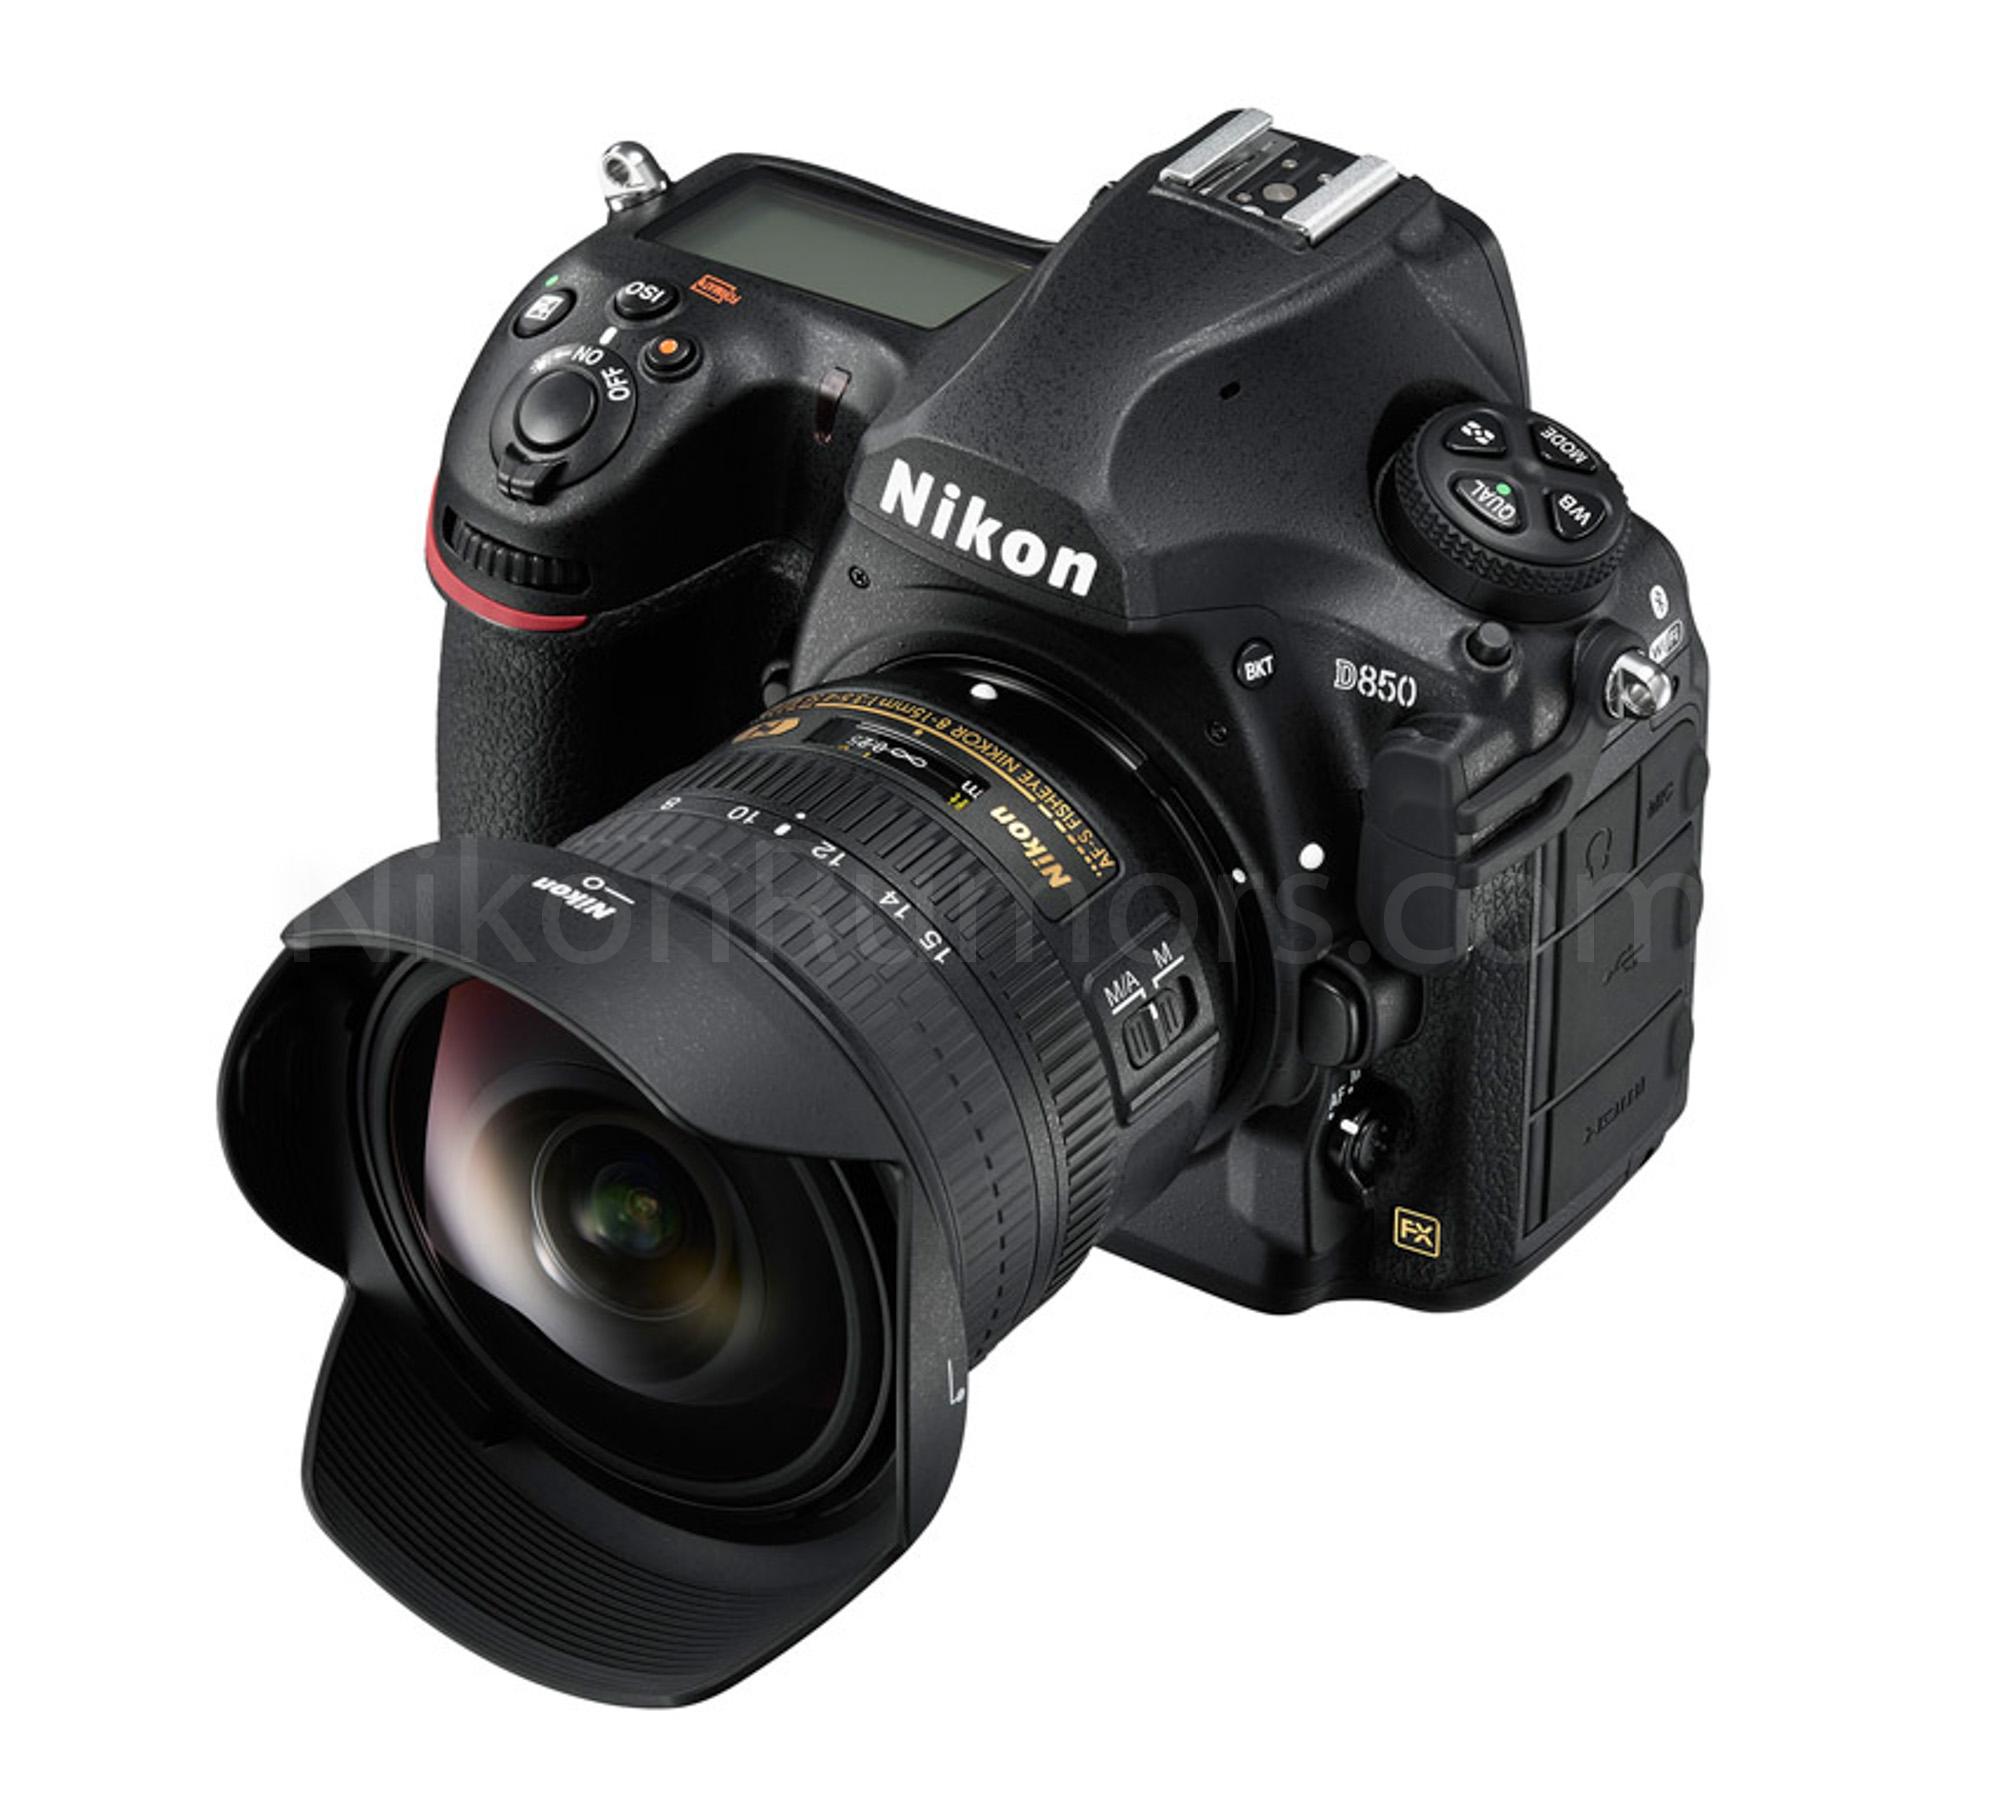 Nikon D850 Officially Announced Us Price 3 296 95